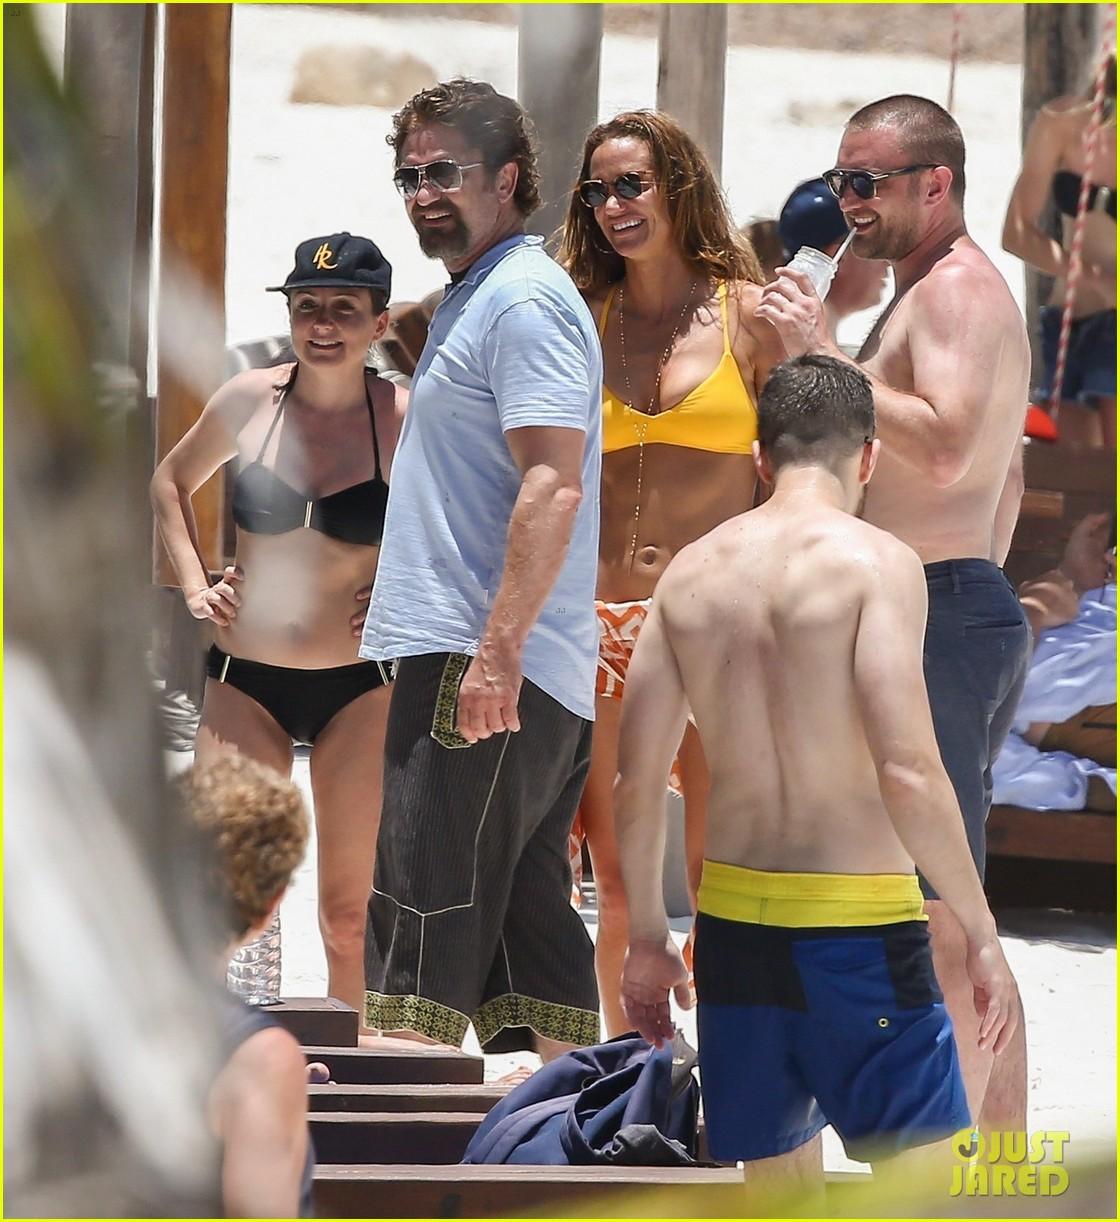 gerard butler on again gf hit the beach in mexico063922442